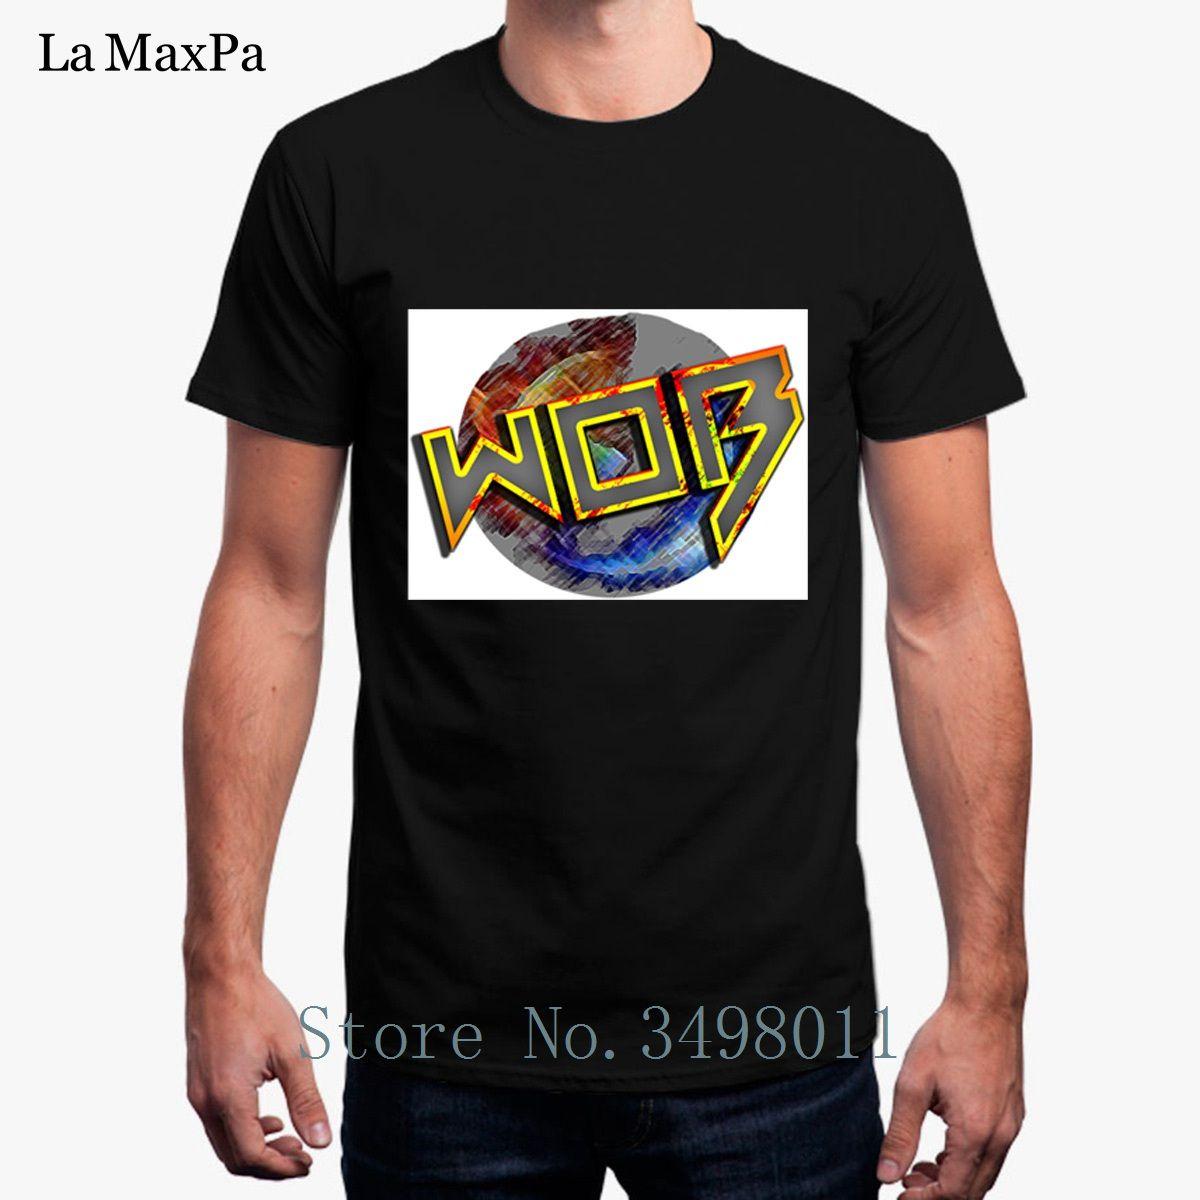 d4d69498 Printed T Shirt World Of Bubs Logo Tshirt Clothes O Neck Cool Short Sleeves  Mens T Shirt Mens S 3xl Hip Hop Camisetas Online Cool Tshirt Designs Create  T ...